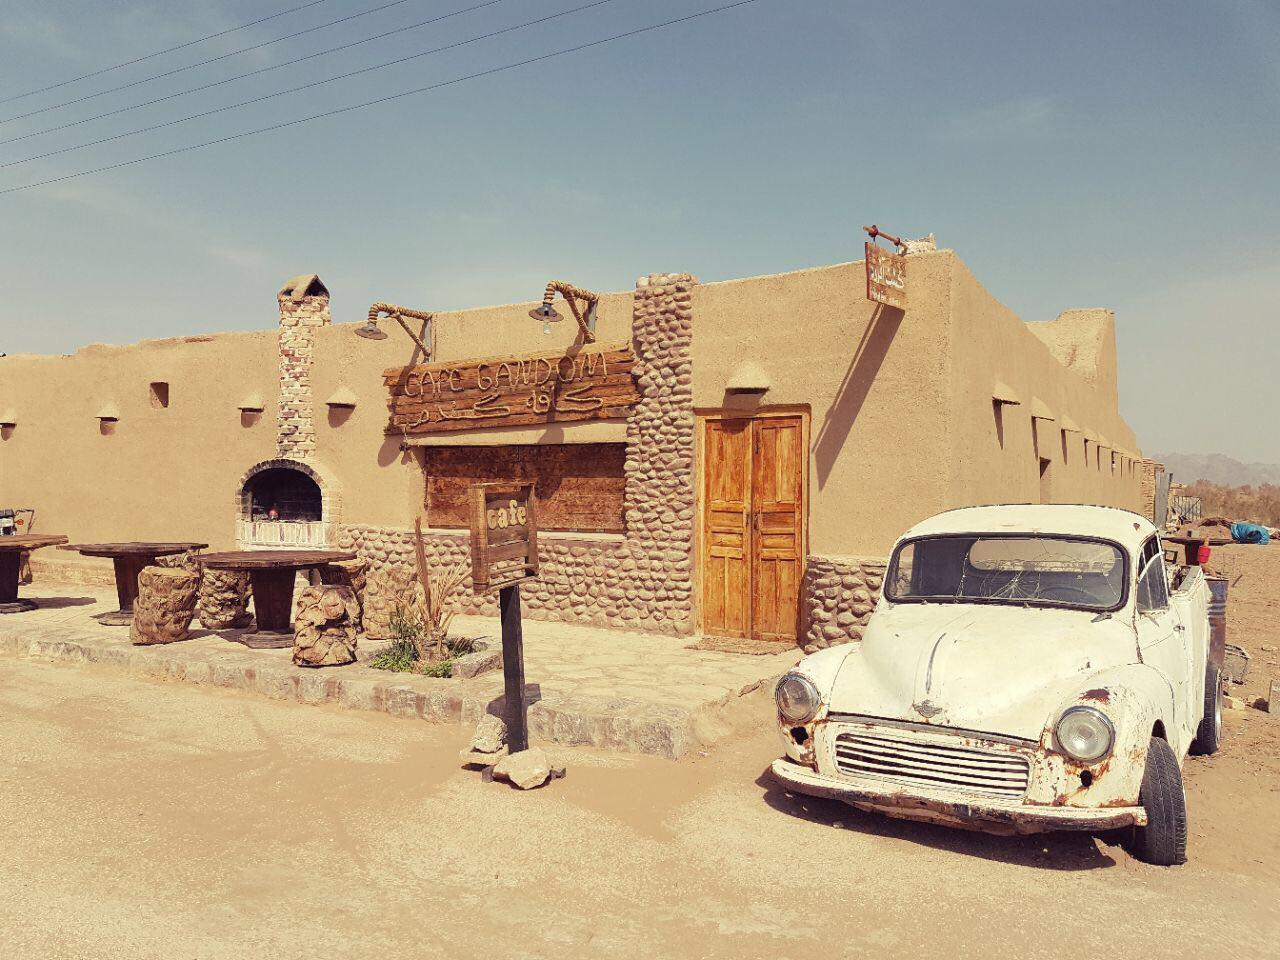 کویر-مرنجاب-ایران-کاشان